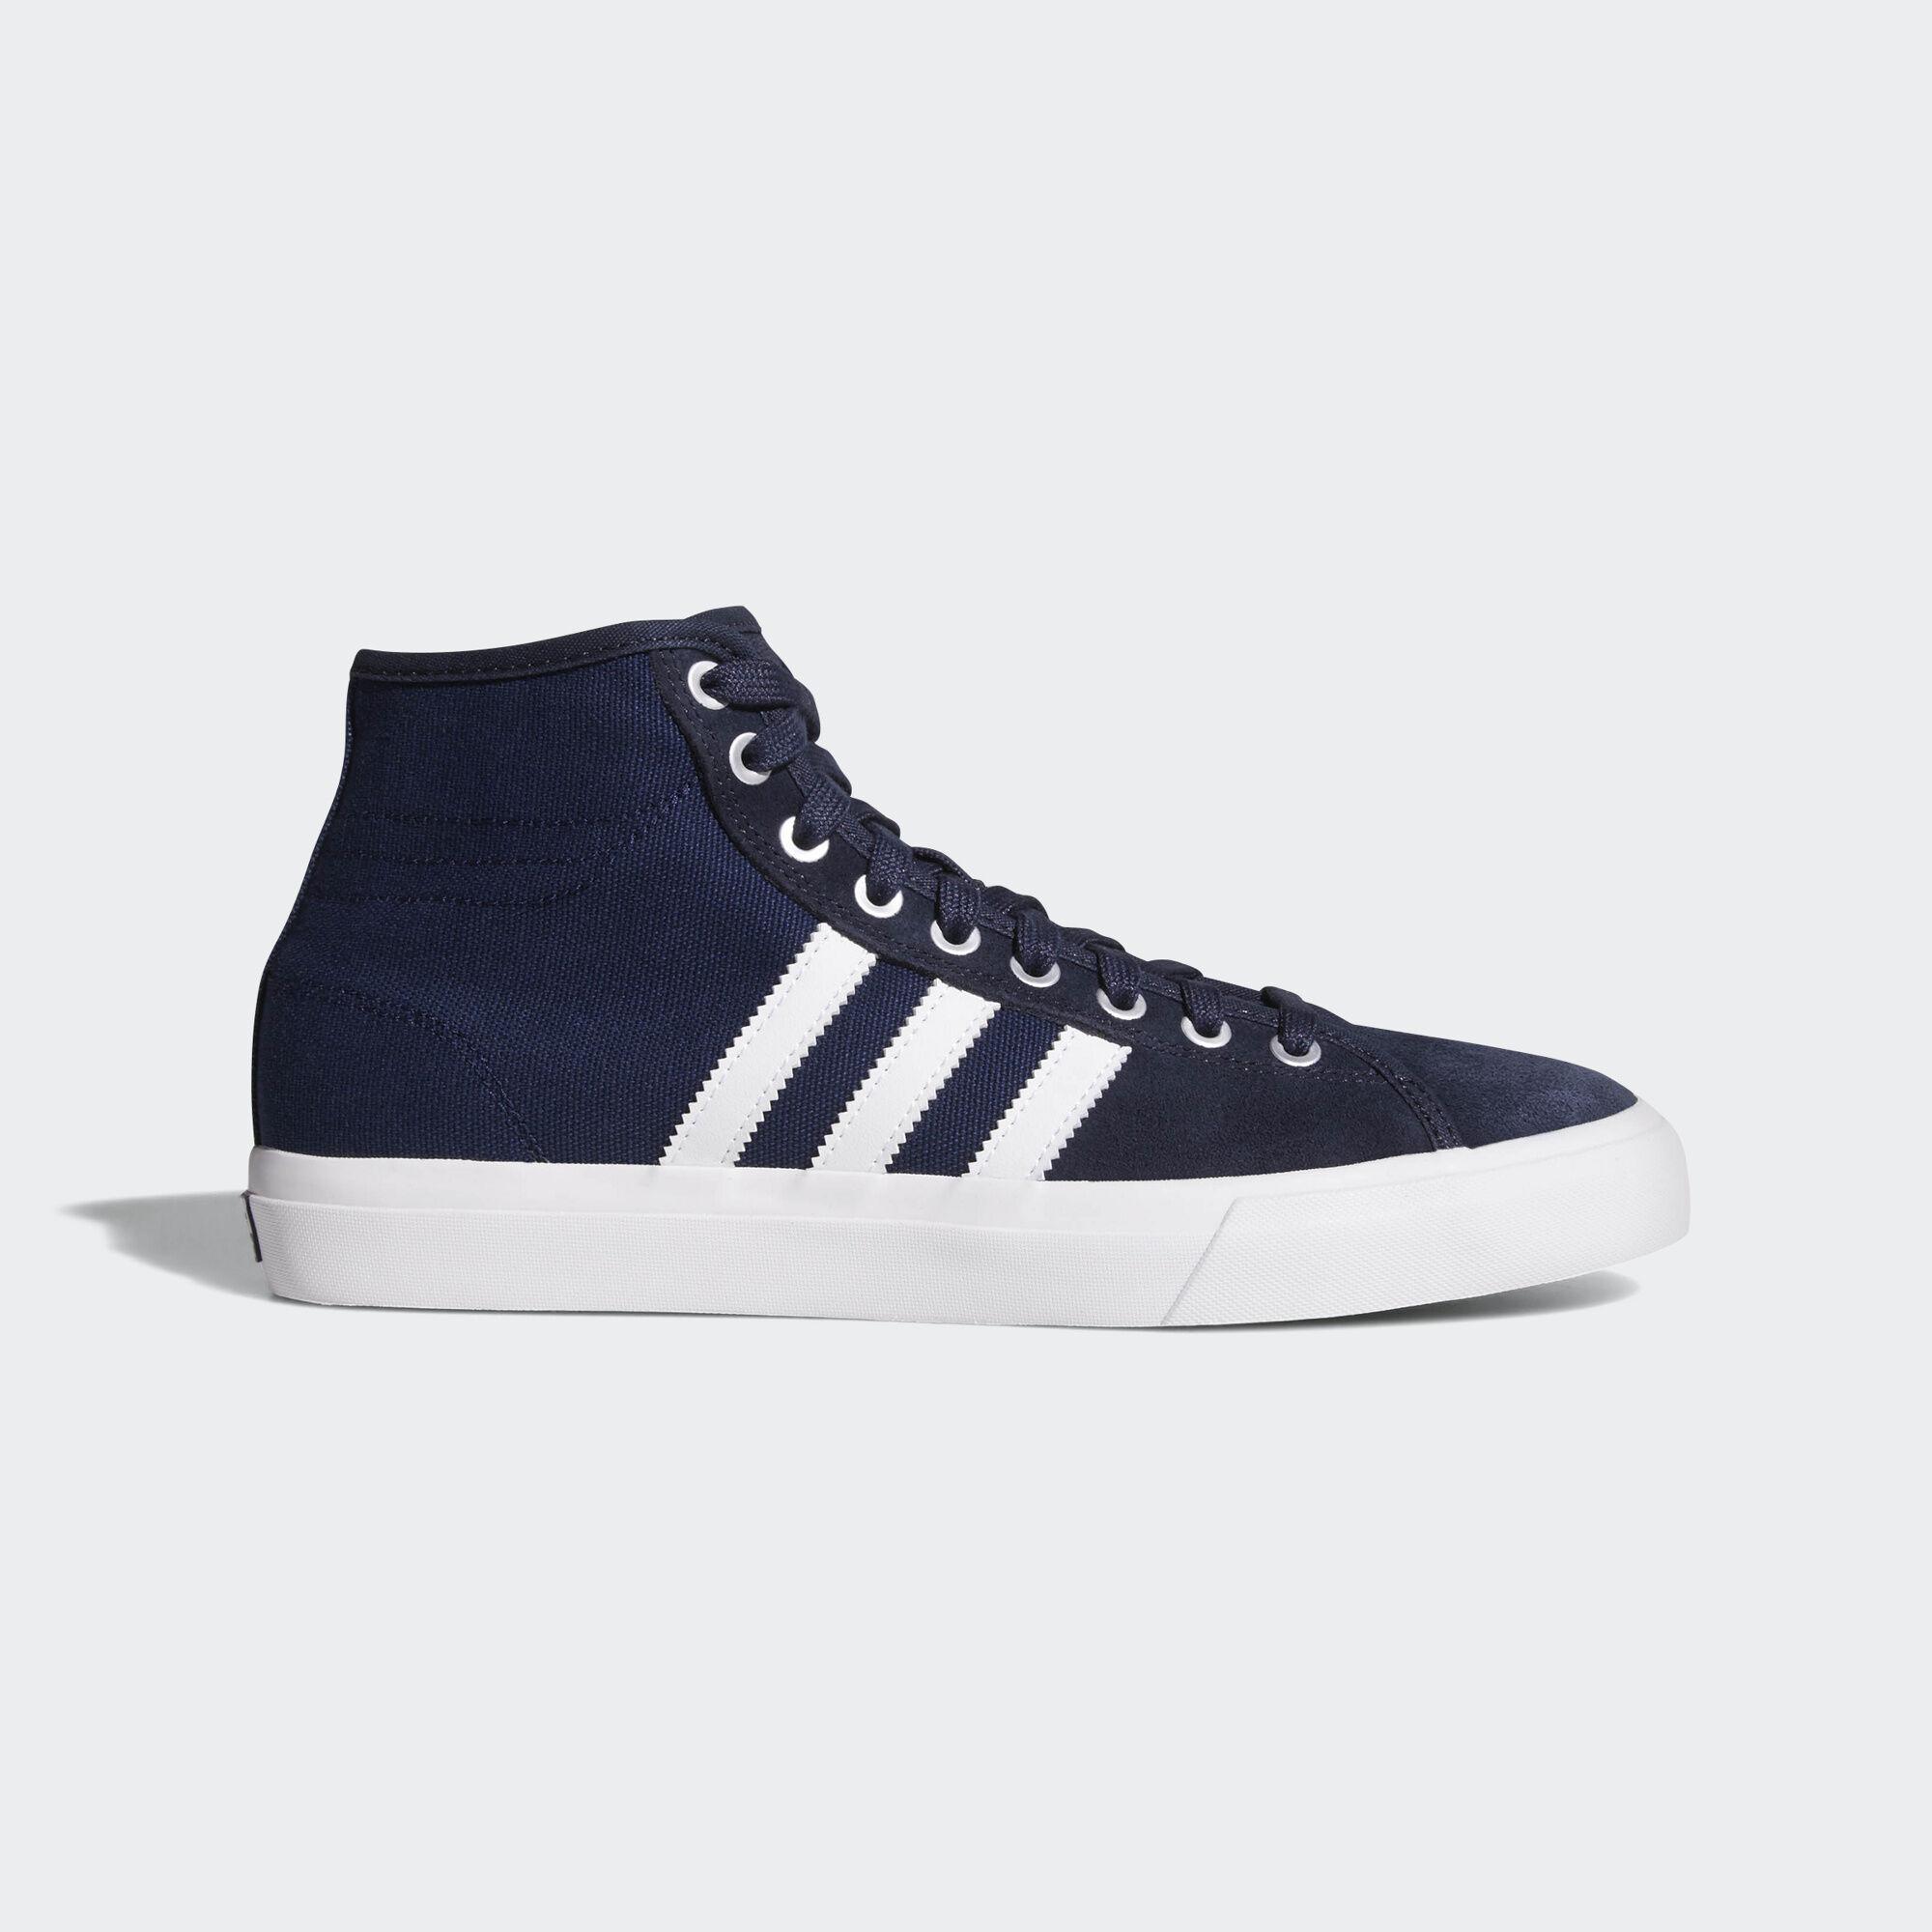 adidas matchcourt high rx shoes blue adidas regional. Black Bedroom Furniture Sets. Home Design Ideas